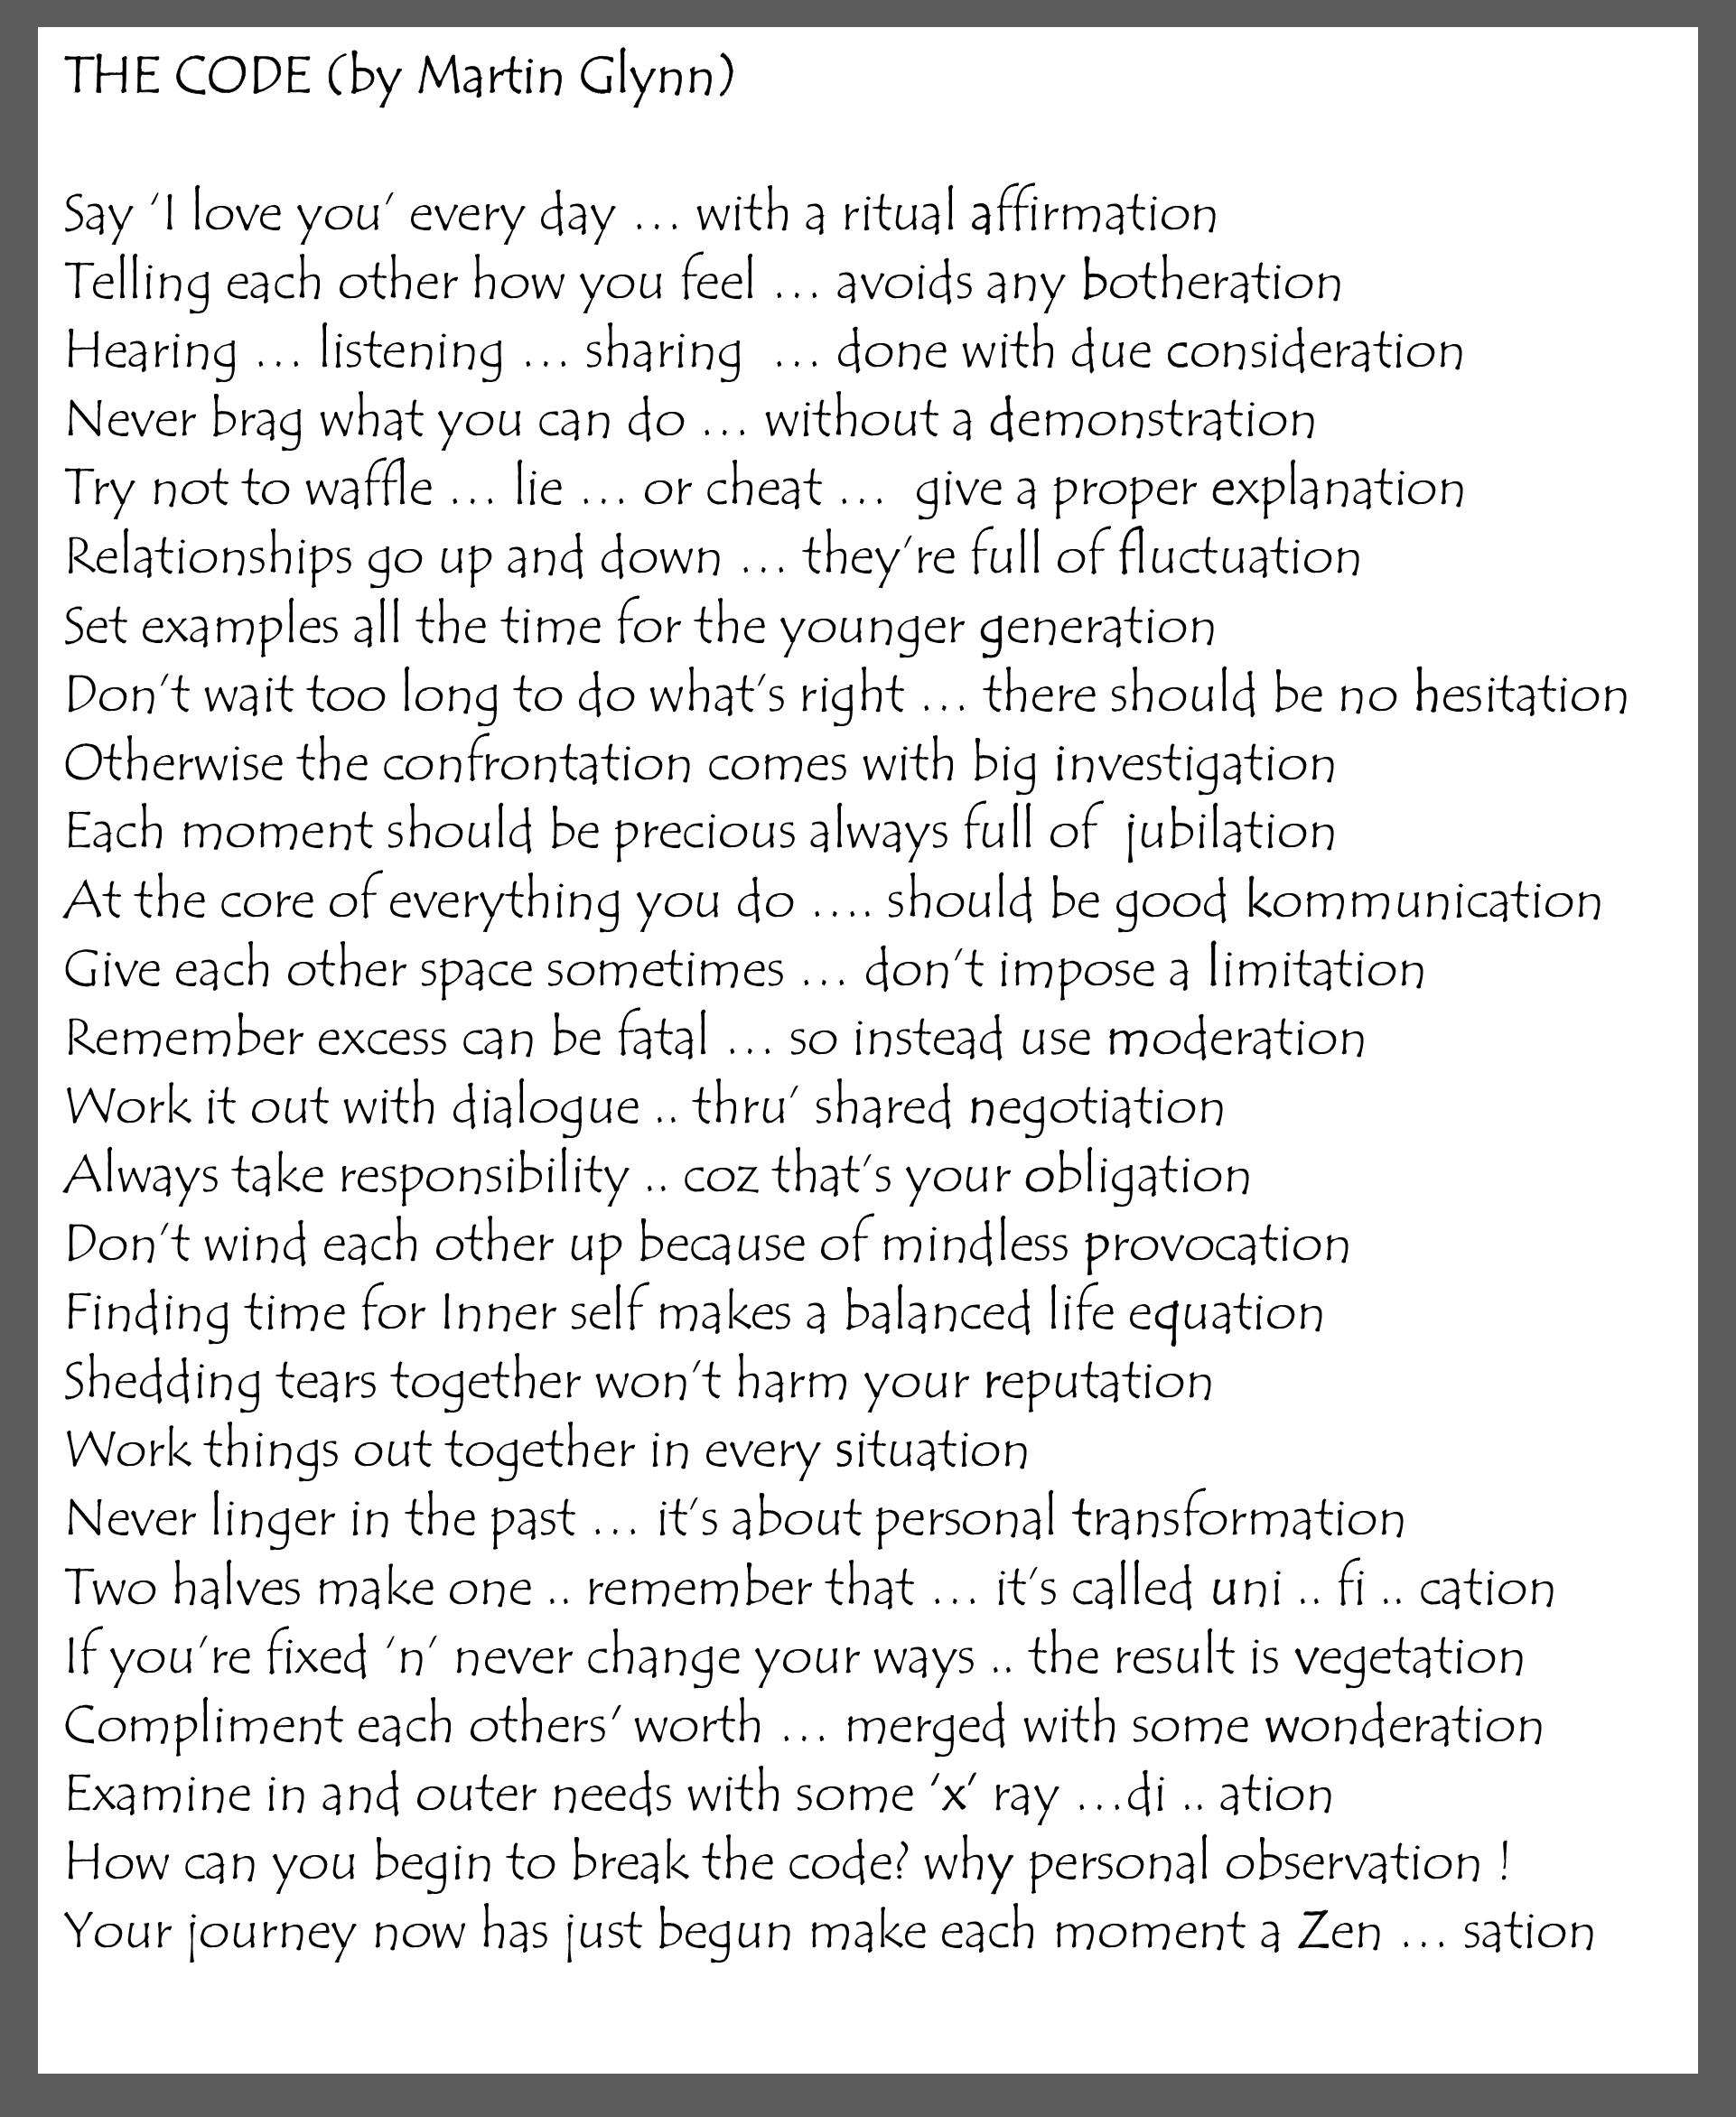 Microsoft Word - THE CODE